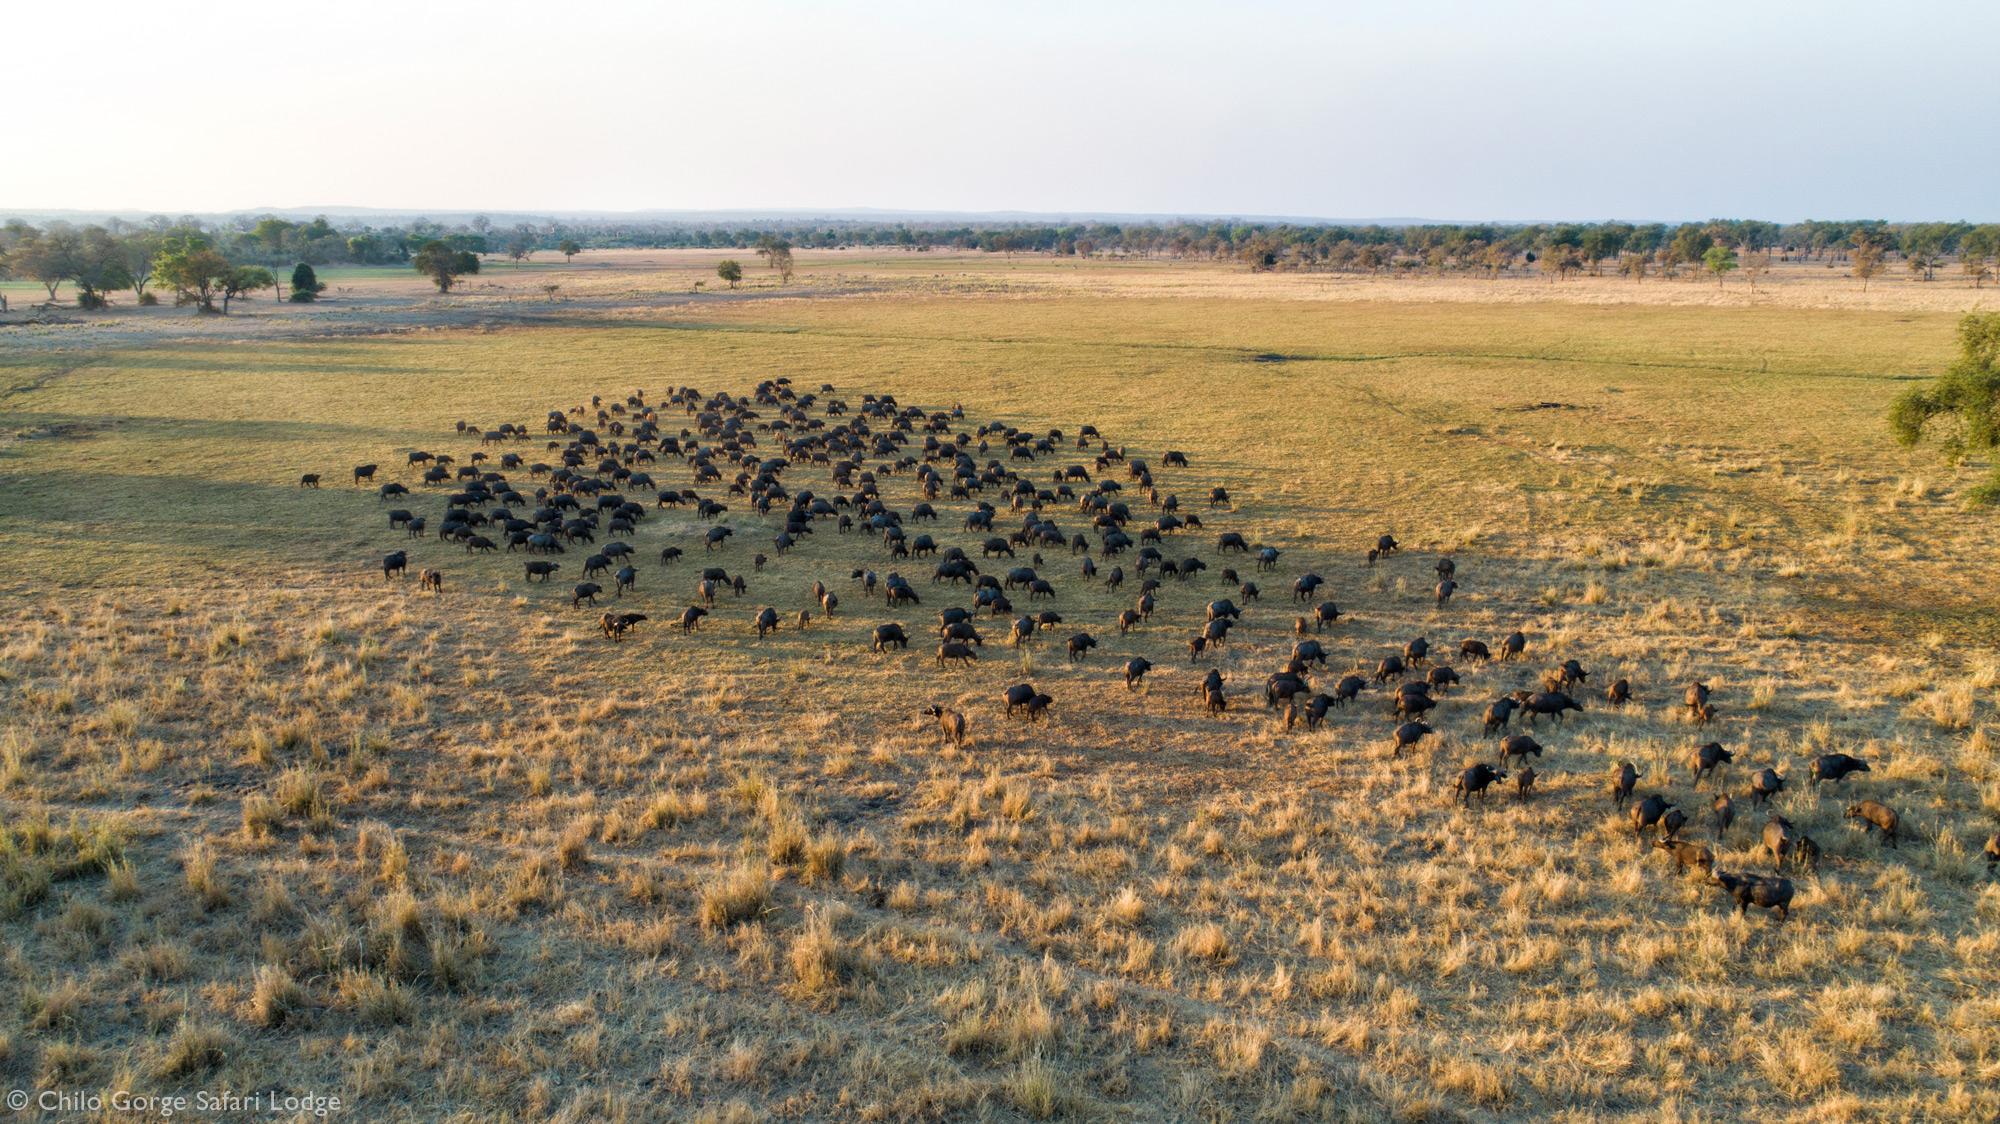 A large herd of buffalo grazing on the fertile Save River floodplain in Zimbabwe